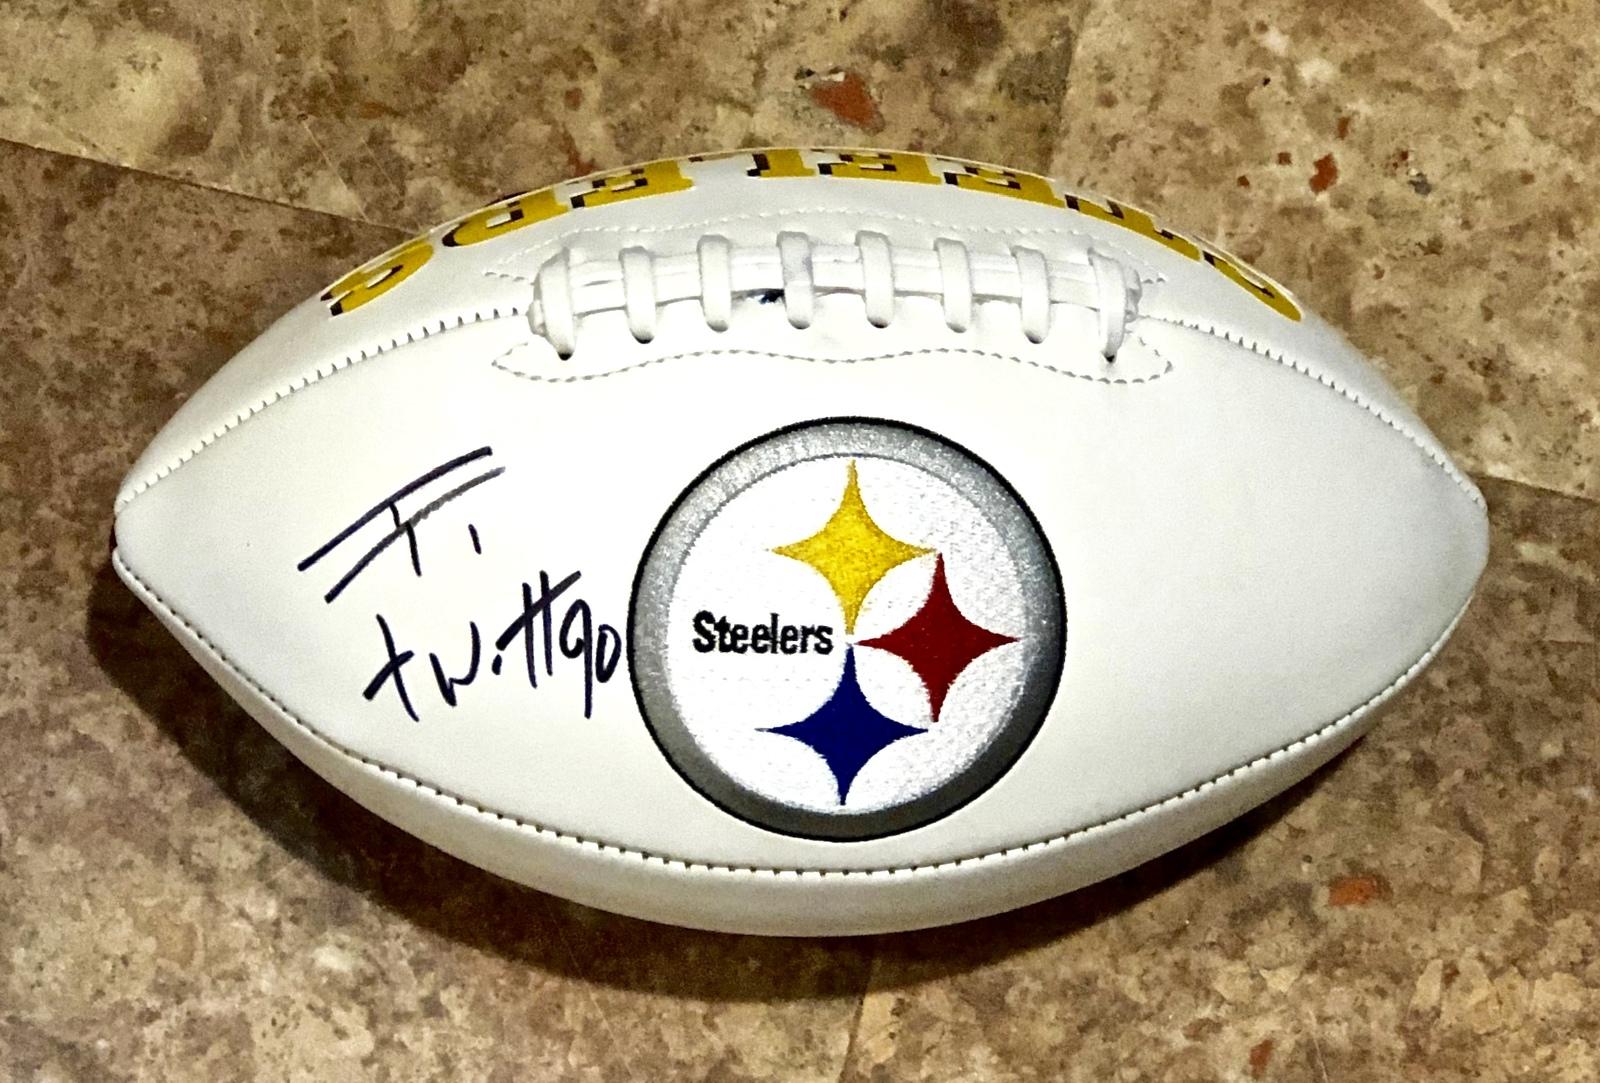 TJ WATT AUTOGRAPHED Hand SIGNED PITTSBURGH STEELERS LOGO FOOTBALL w/COA  - $149.99